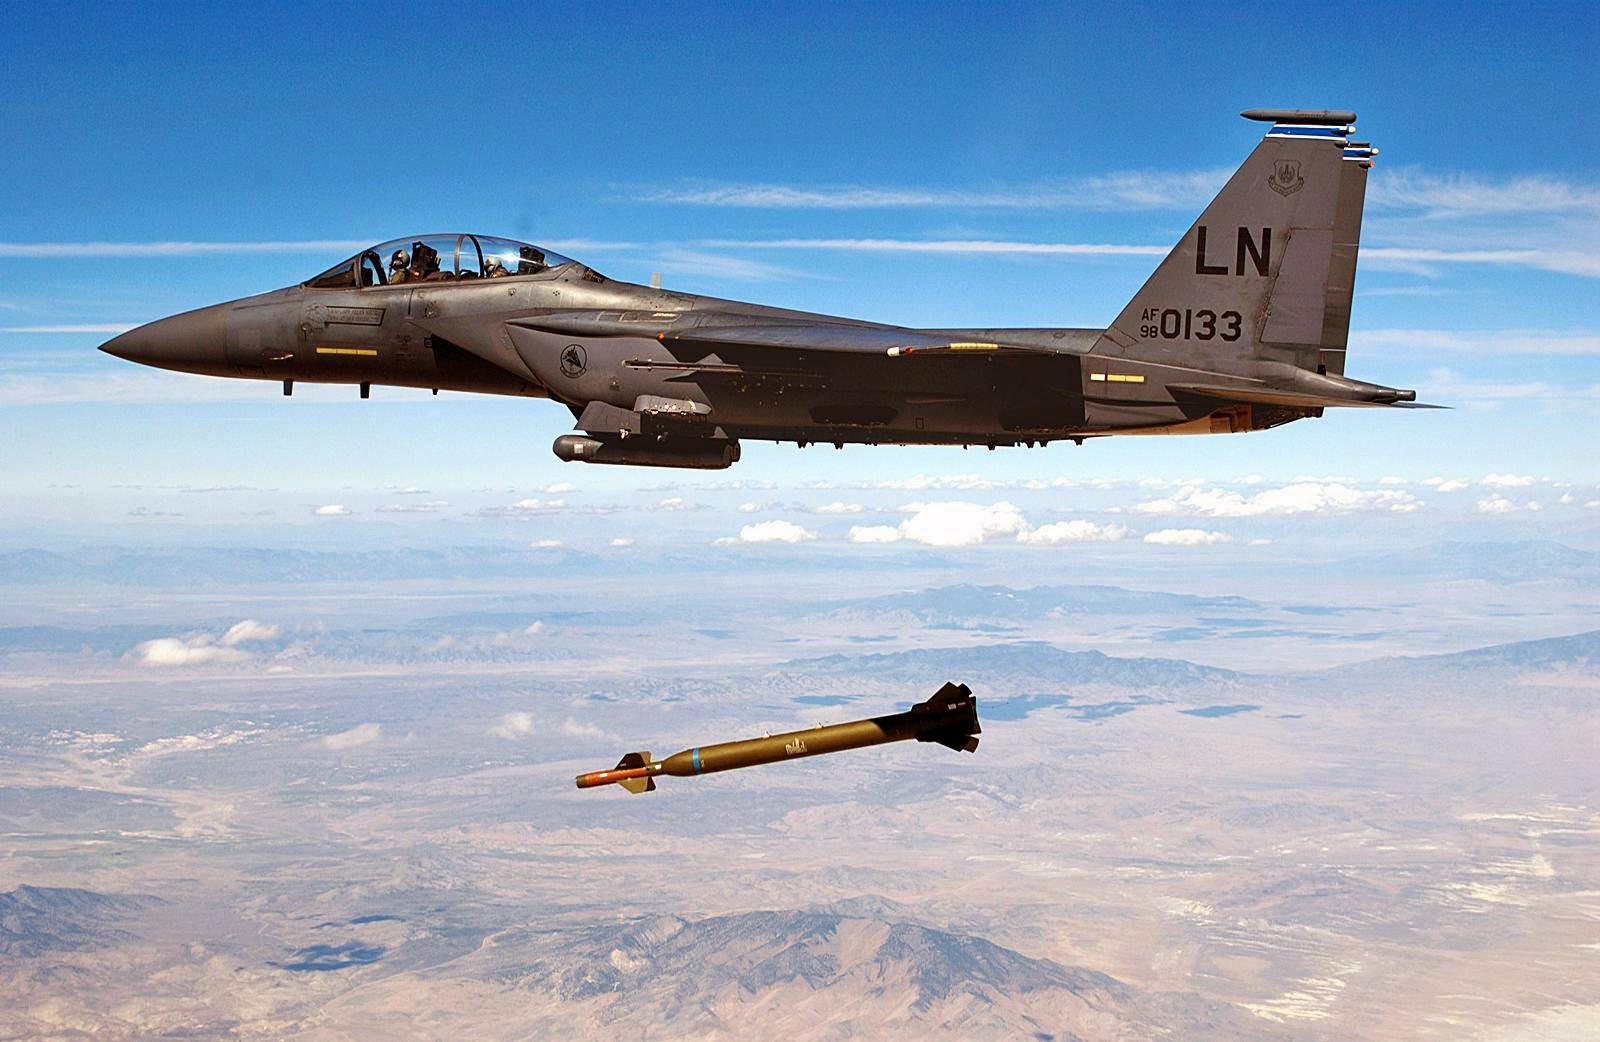 Armas aéreas